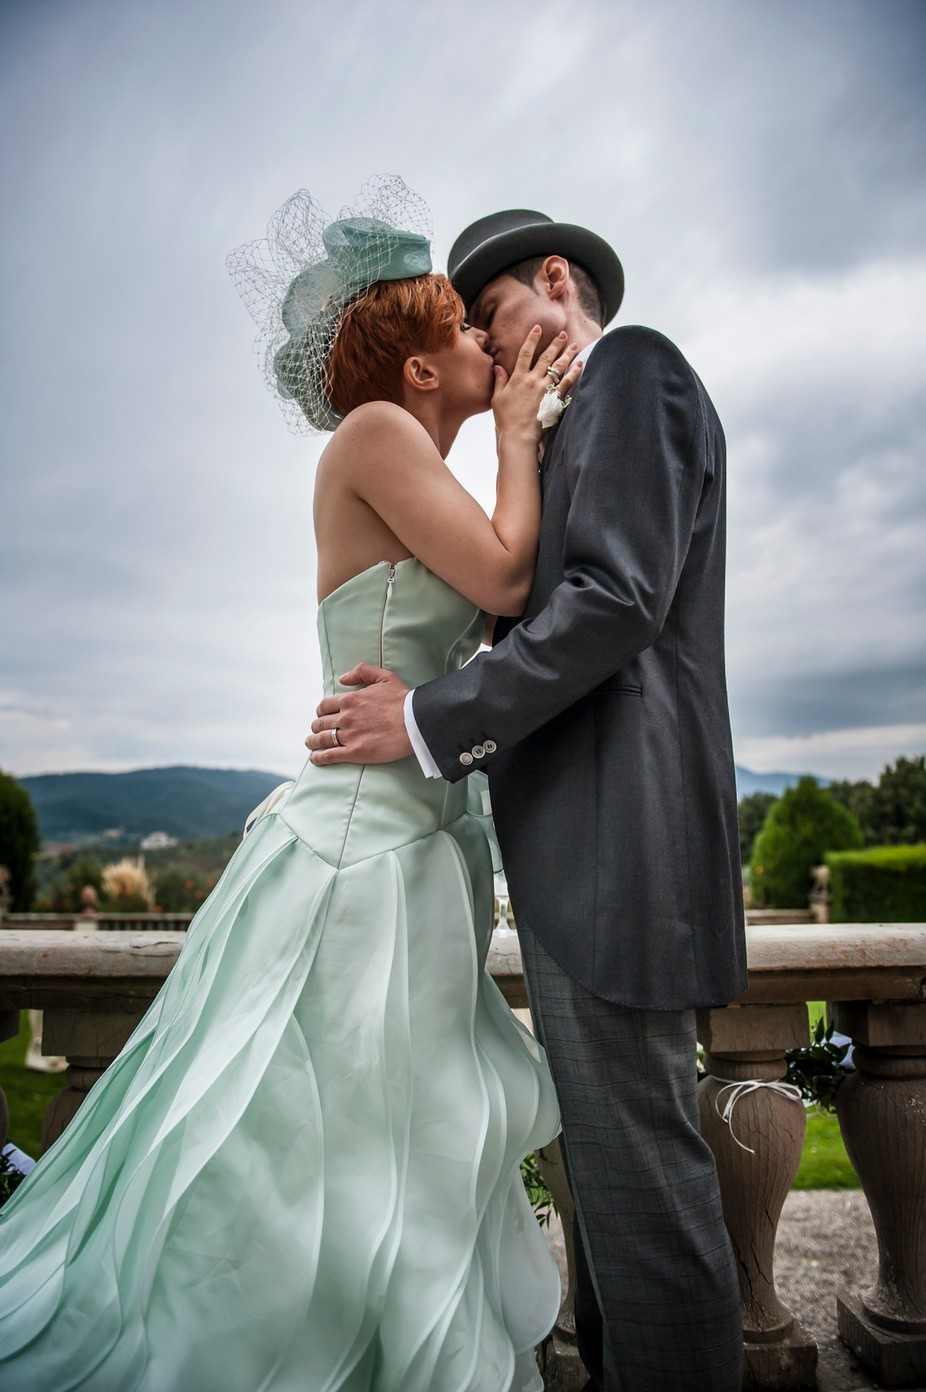 True Love by Ulisse - Love Photo Contest Valentines